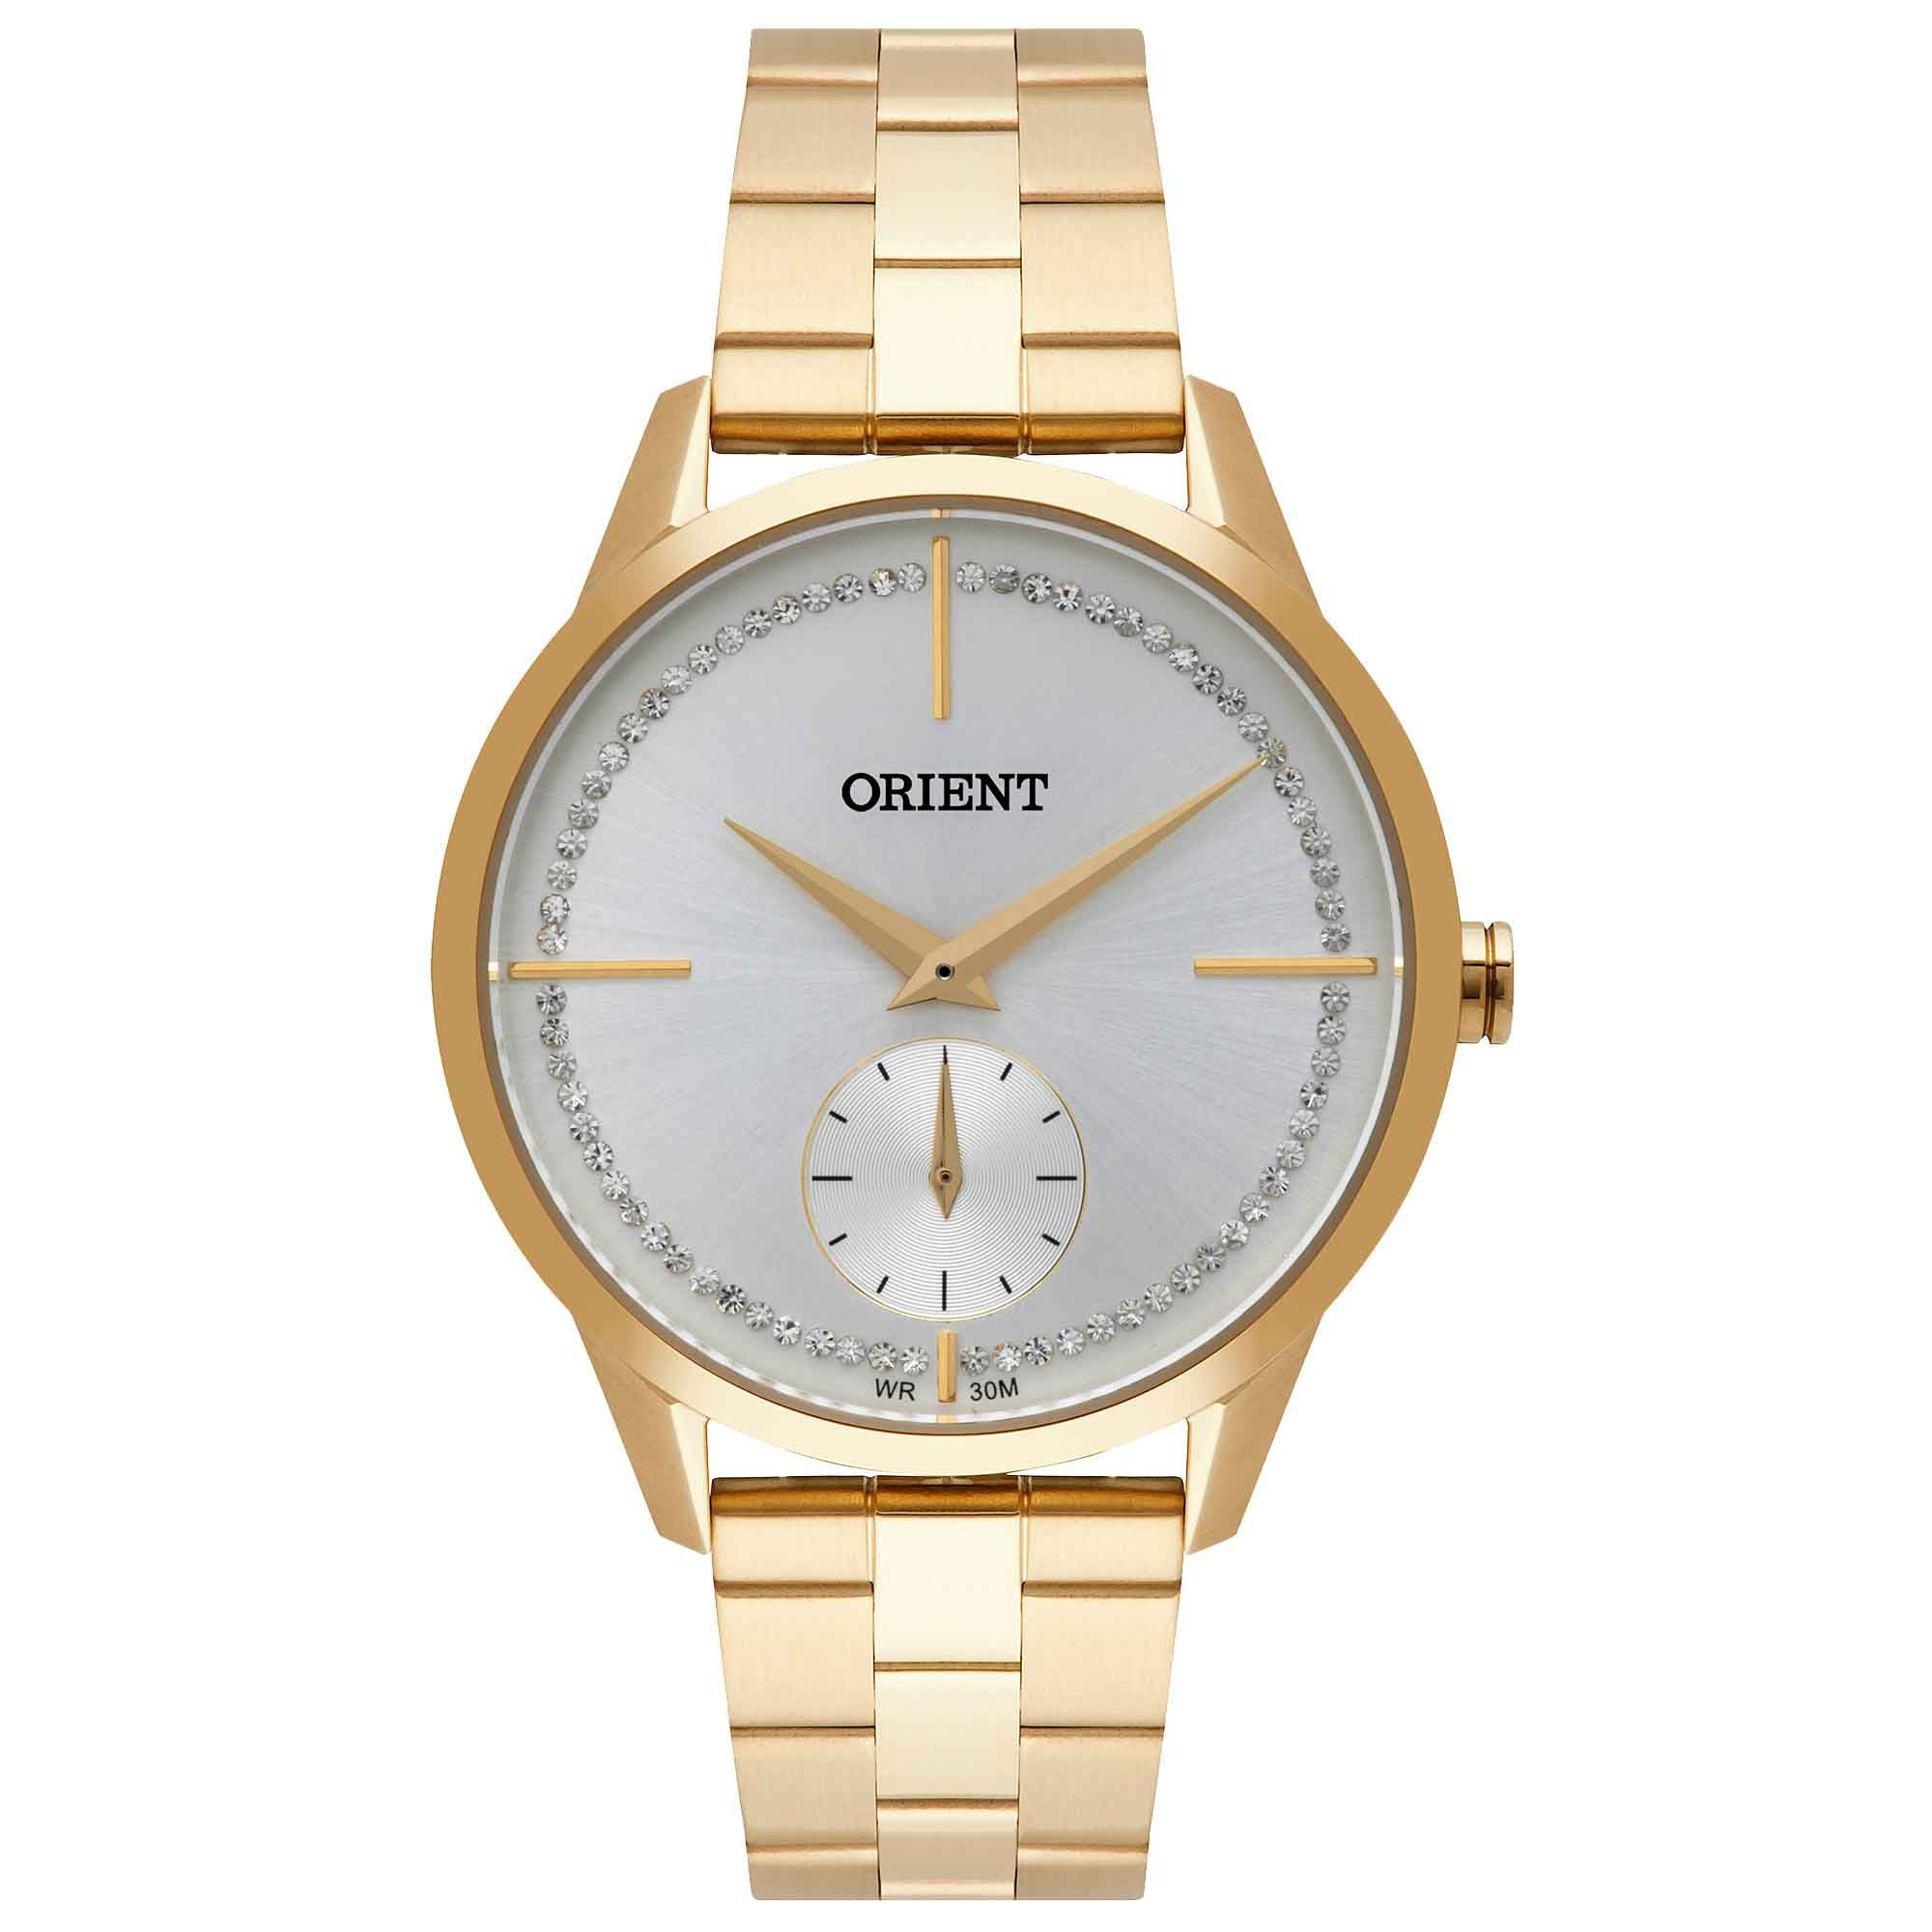 Relógio Feminino Orient FGSS0103 S1KX